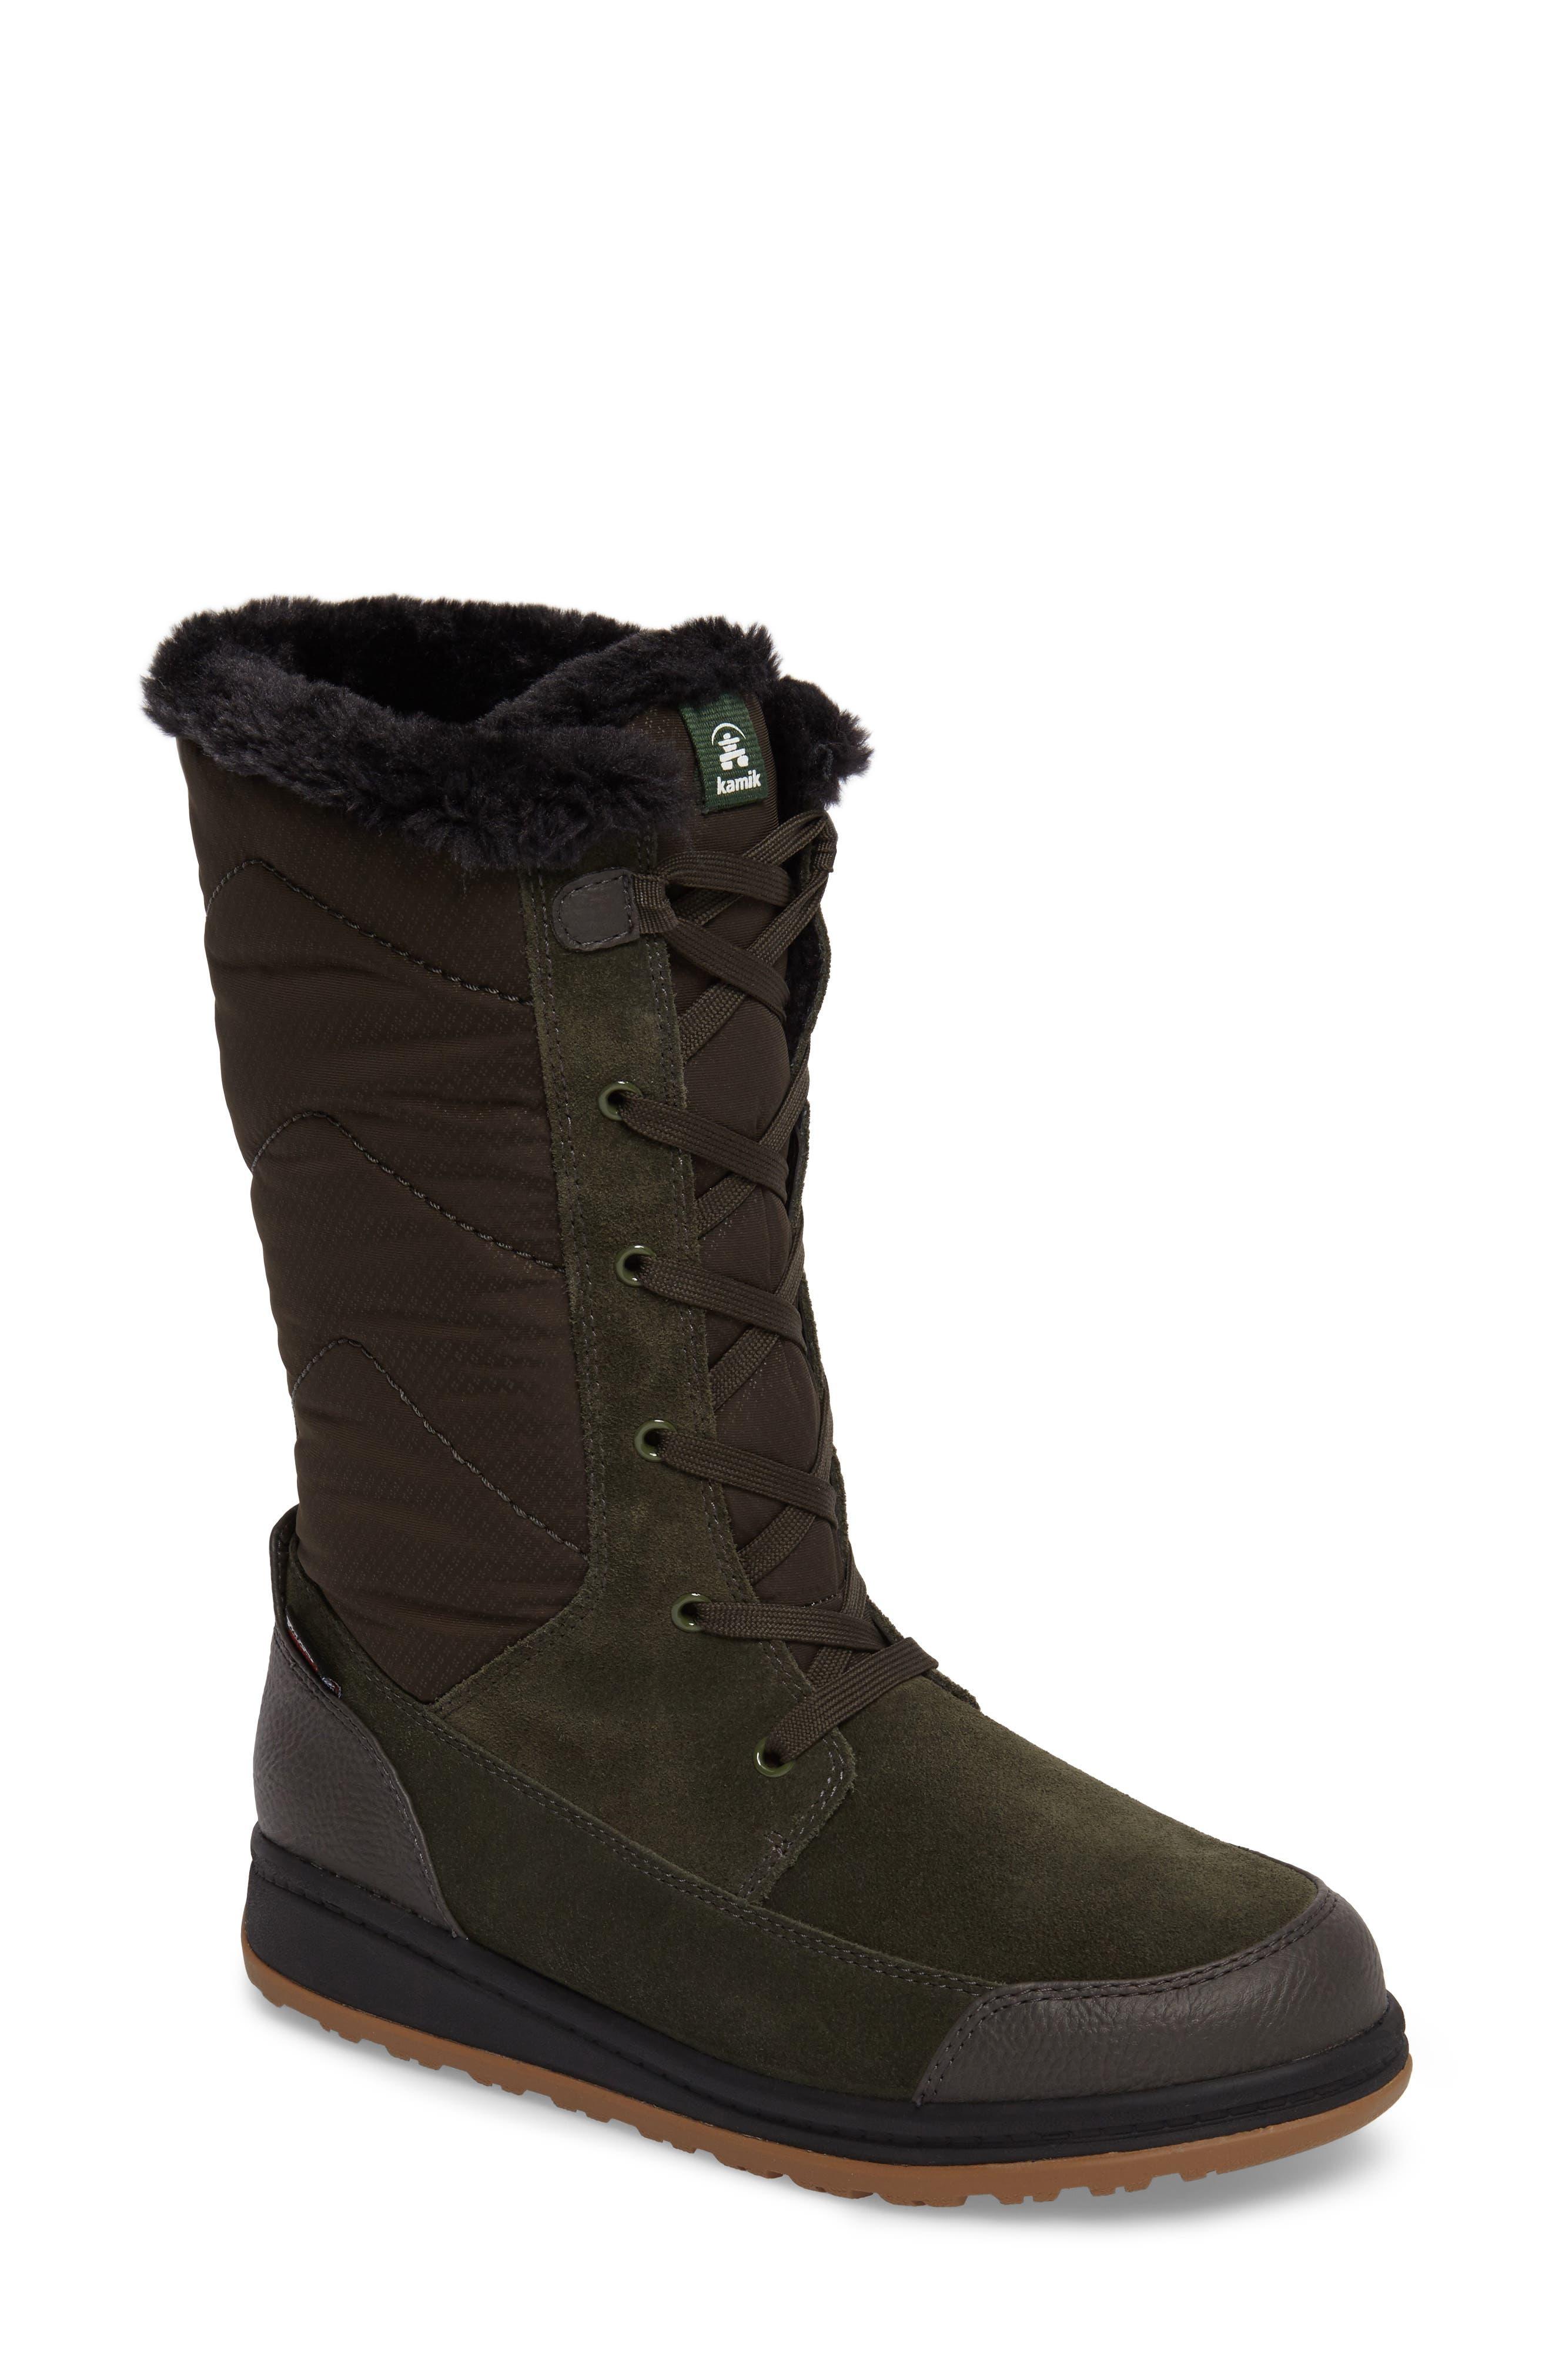 Main Image - Kamik QuincyS Waterproof Boot (Women)